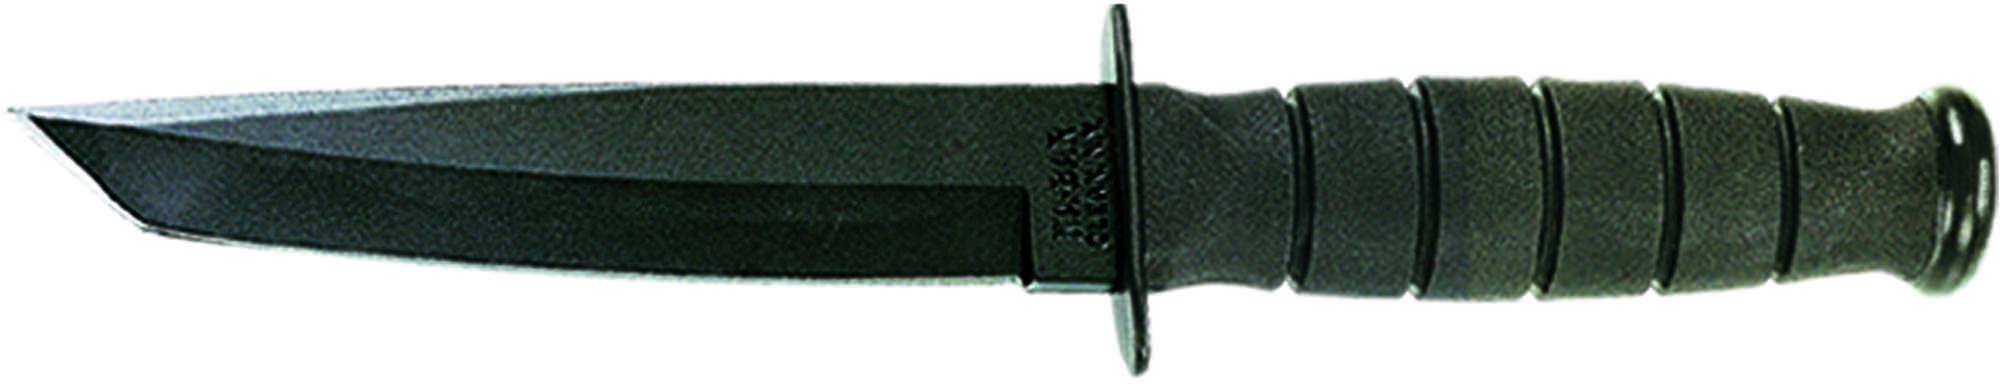 Ka-Bar Black Short Fighting/Utility Knife Tanto, Black, Clampack Md: 4-1254CP-7